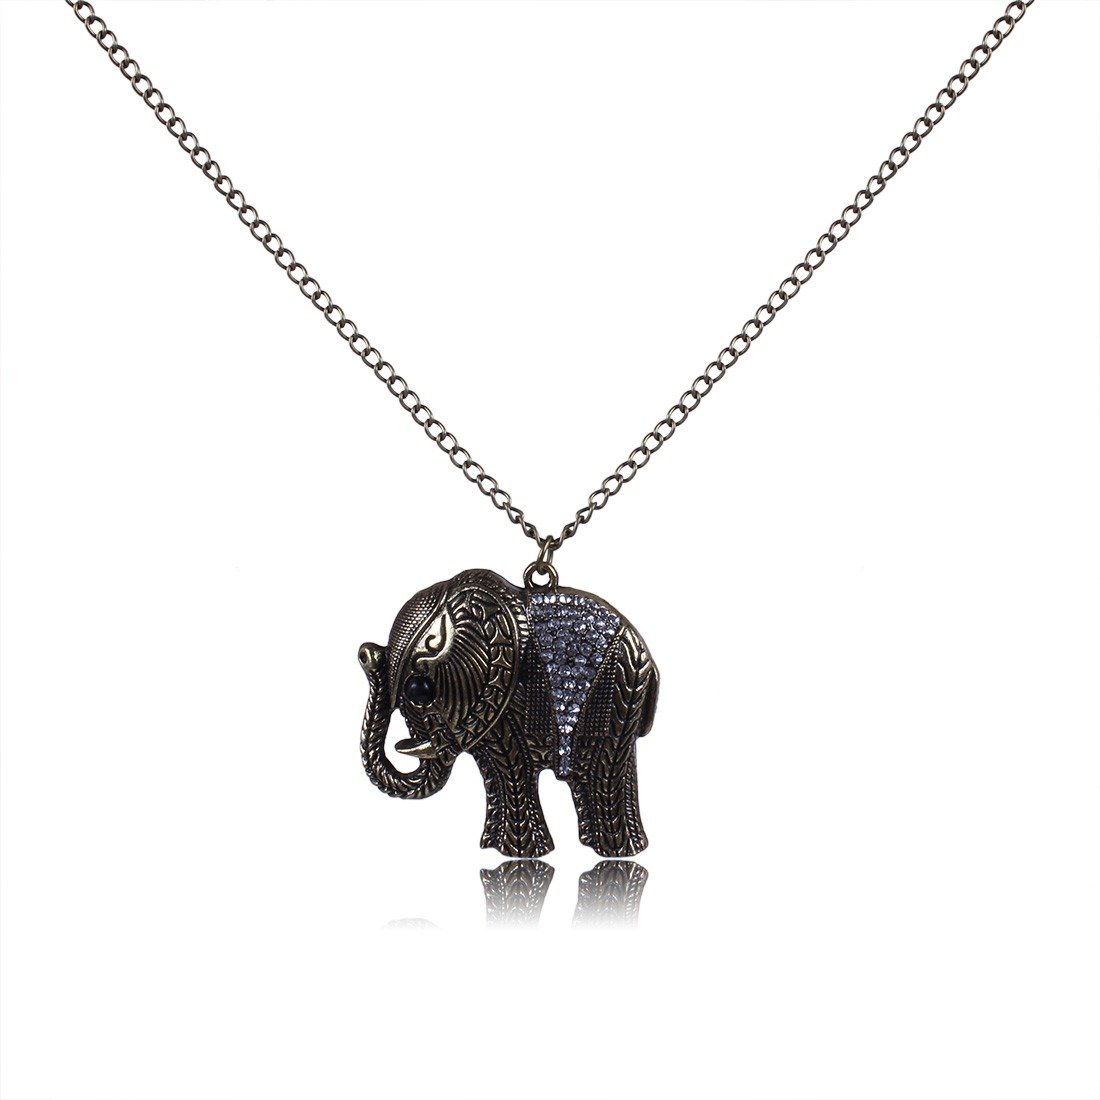 Qiyun Fortune Brings Animal Elephant Antique Brass Tone Pendant Chain Necklace Cz Animaux Laiton D'e le phant Cz Collier W005N1361